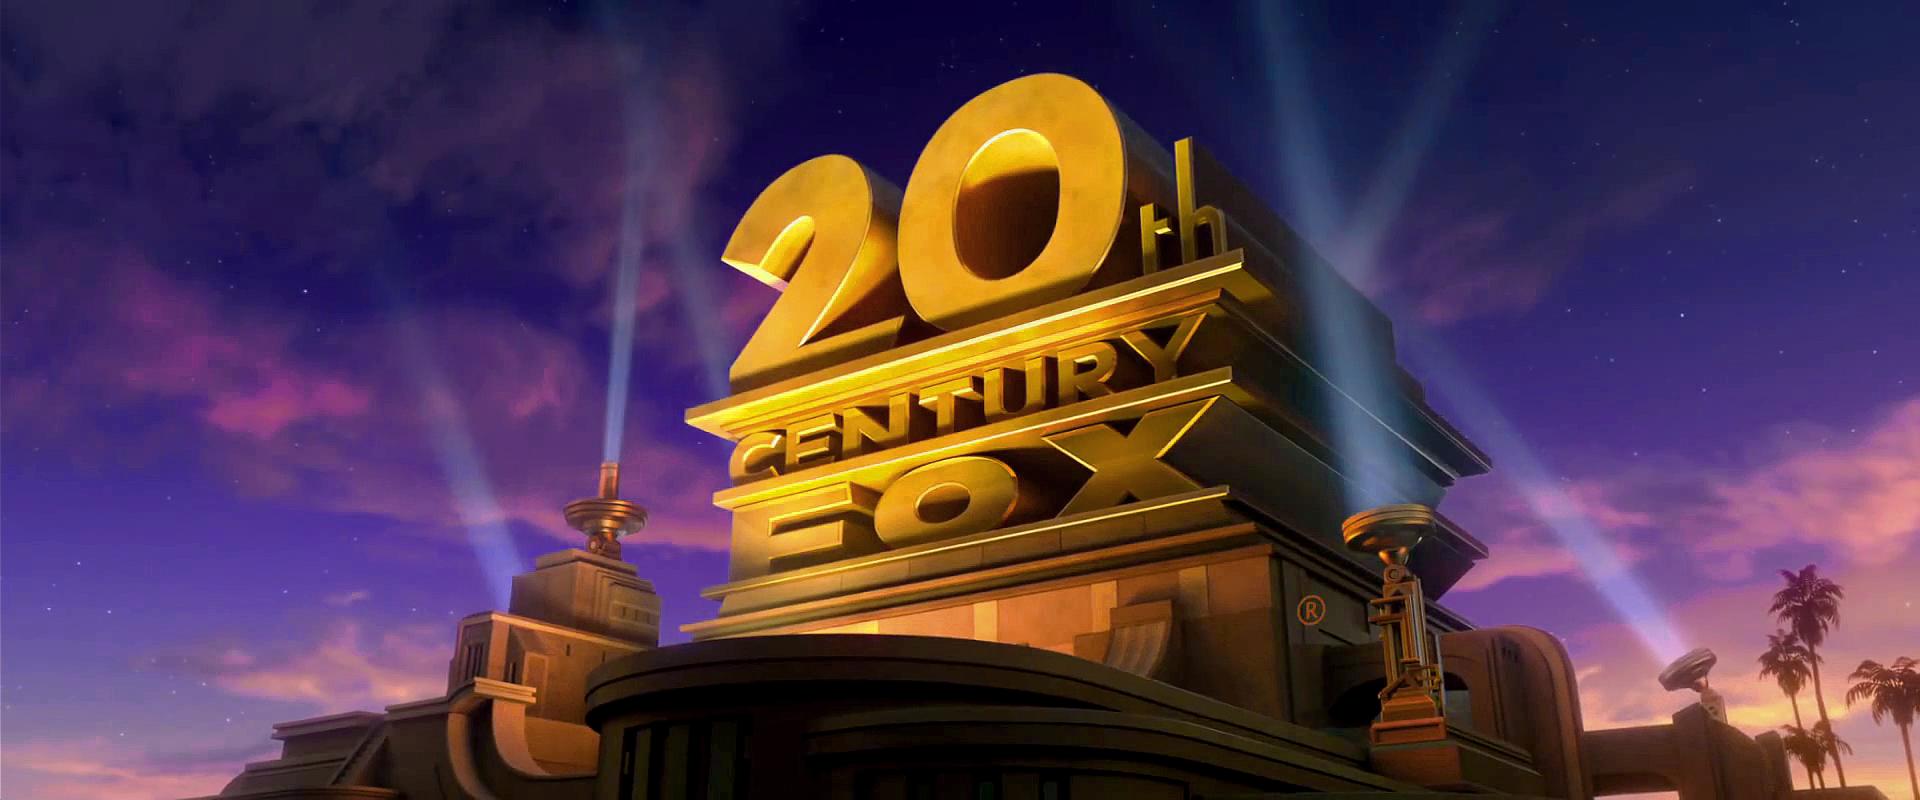 20th-Century-Fox-2013-logo